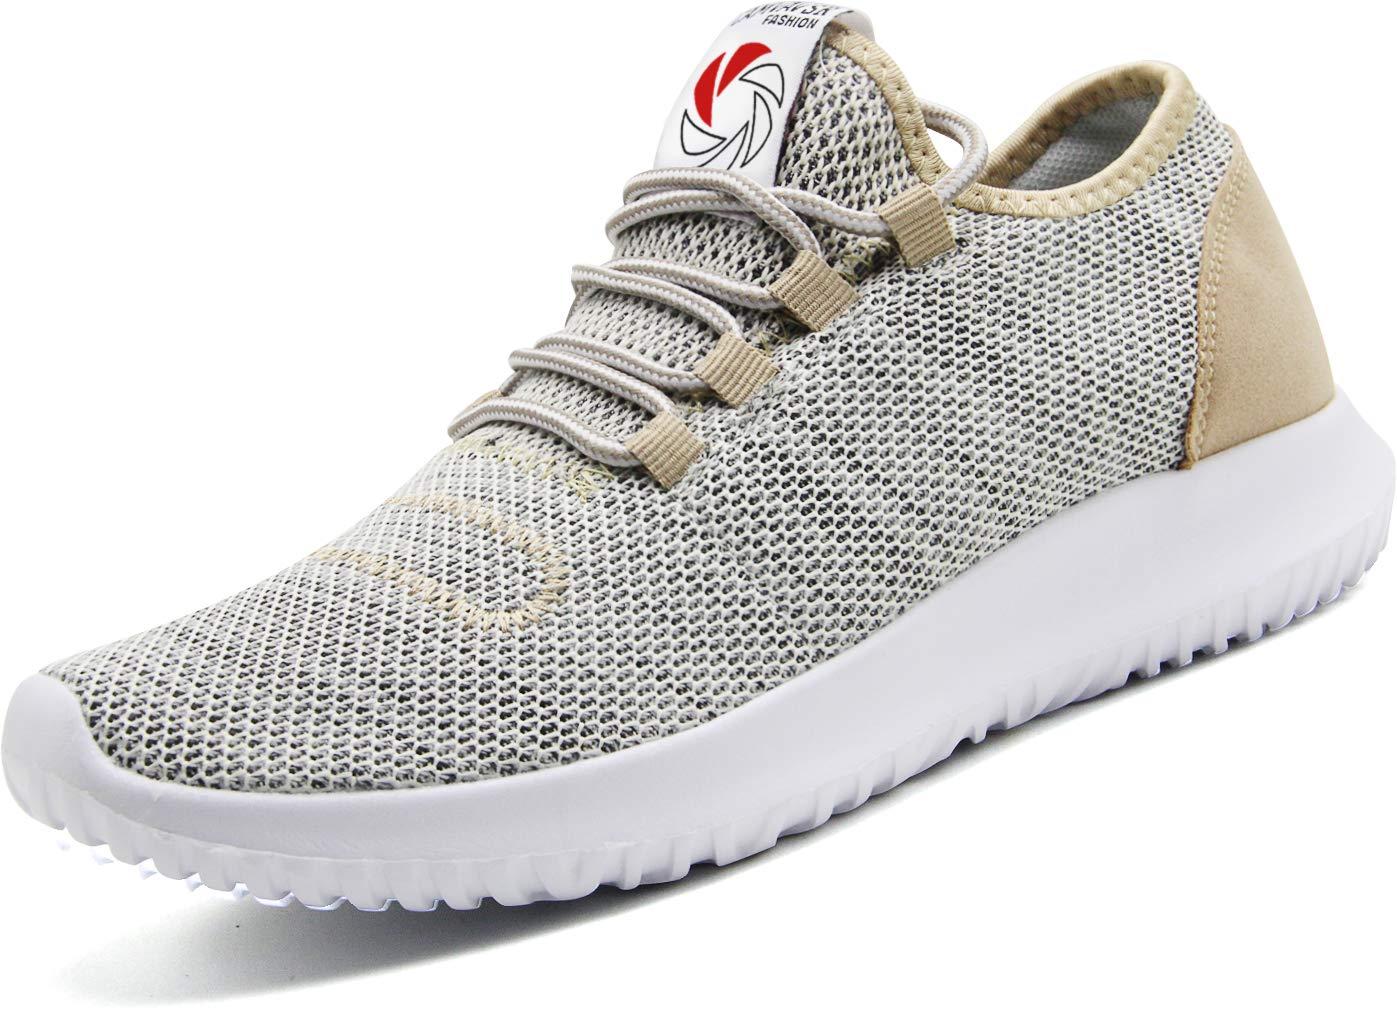 CAMVAVSR Men's Gym Shoes Fashion Slip on Lightweight Casual Workout Outdoor Walk Shoes for Men Gold Size 11 by CAMVAVSR